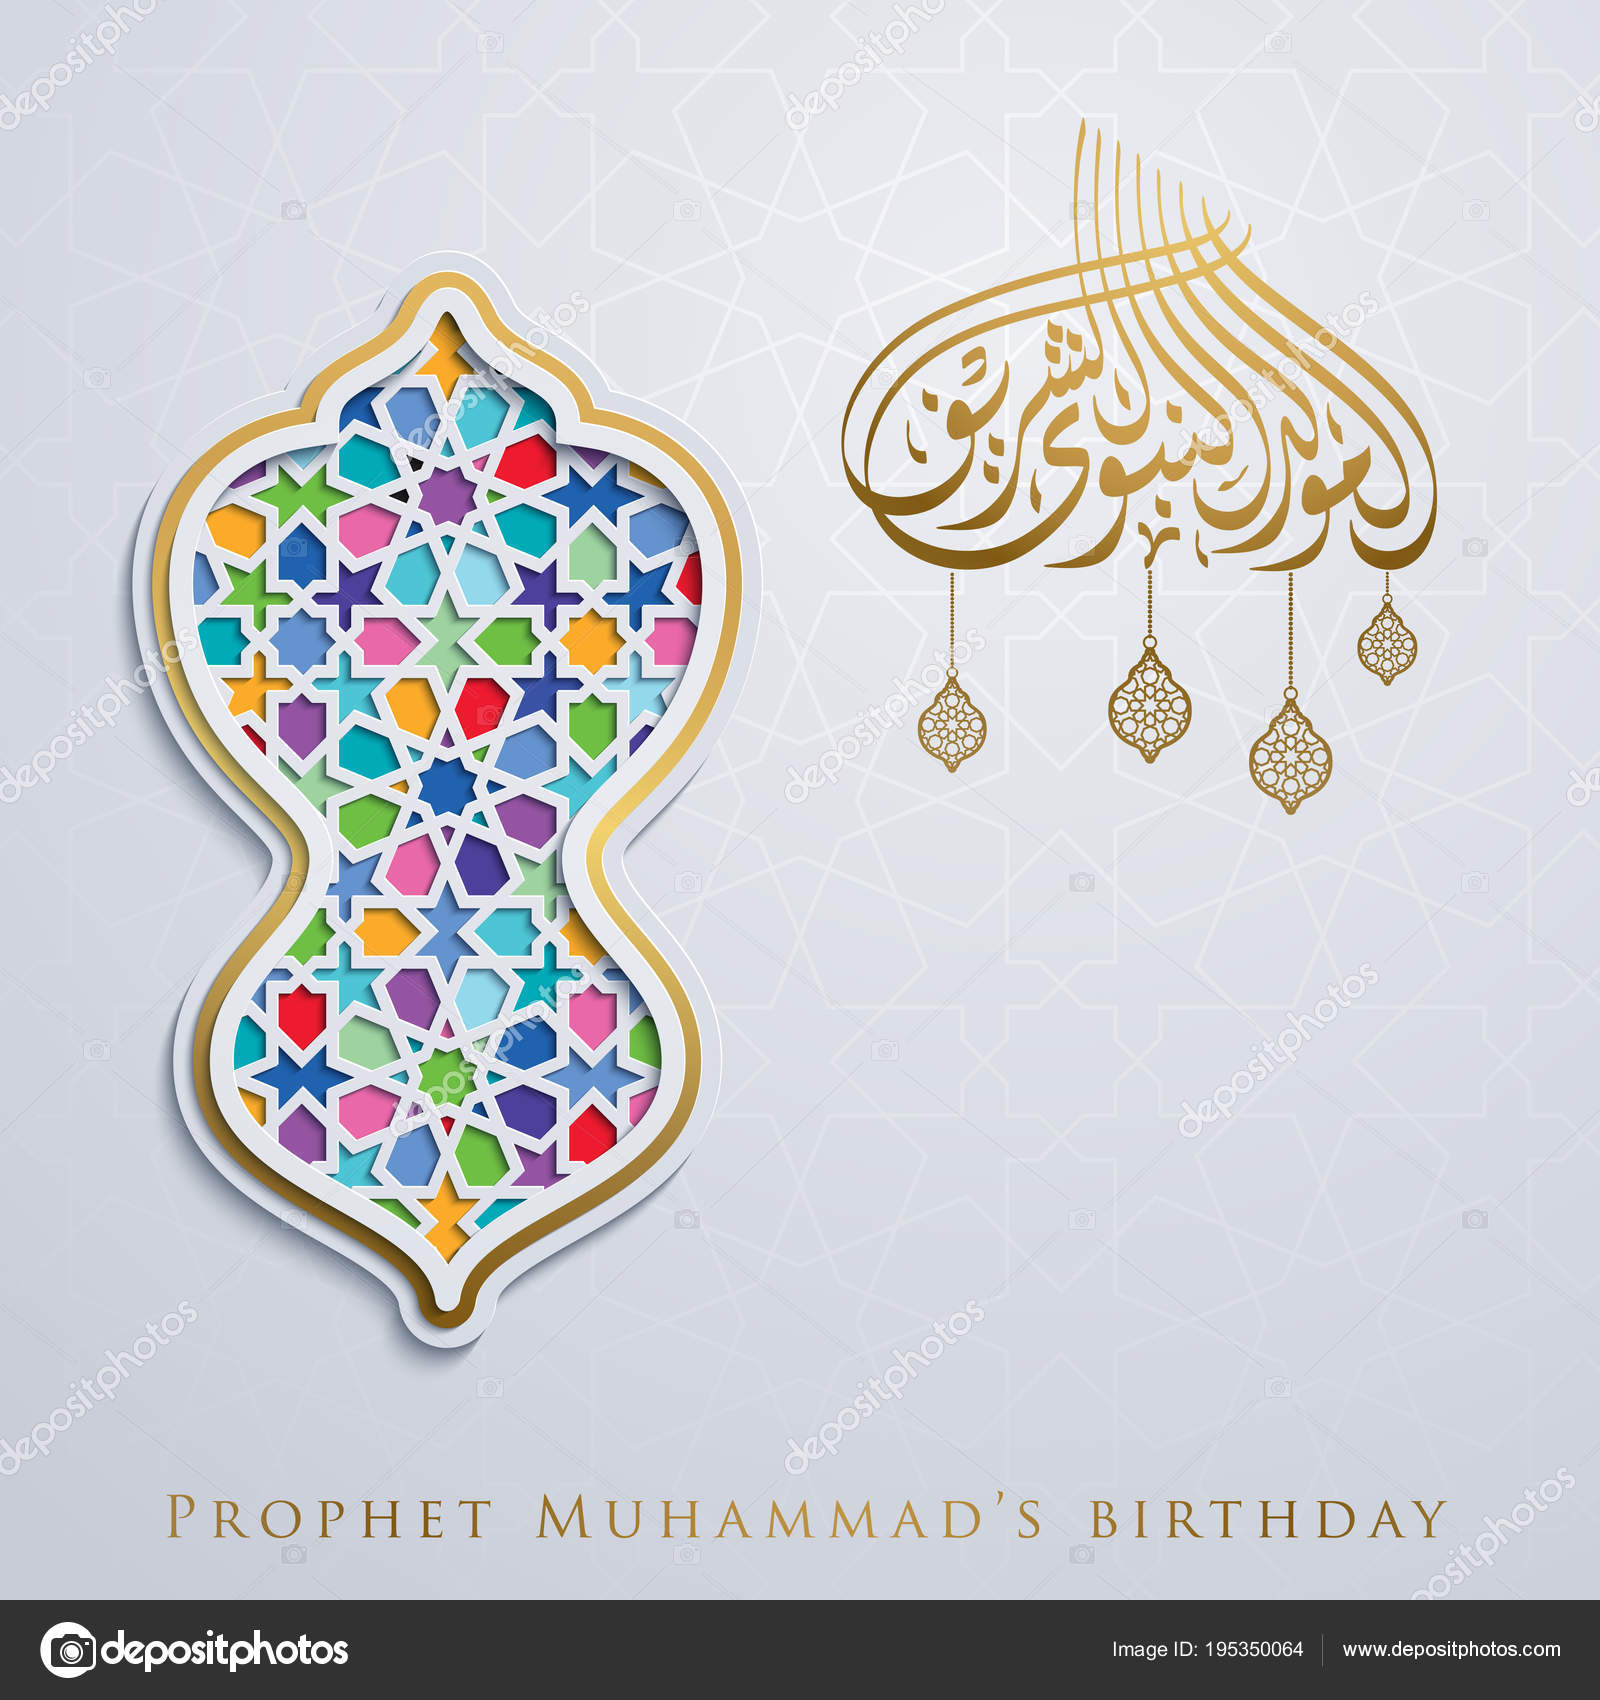 Mawlid nabi islamic greeting arabic pattern calligraphy mean prophet mawlid nabi islamic greeting arabic pattern calligraphy mean prophet muhammad stock vector m4hsunfo